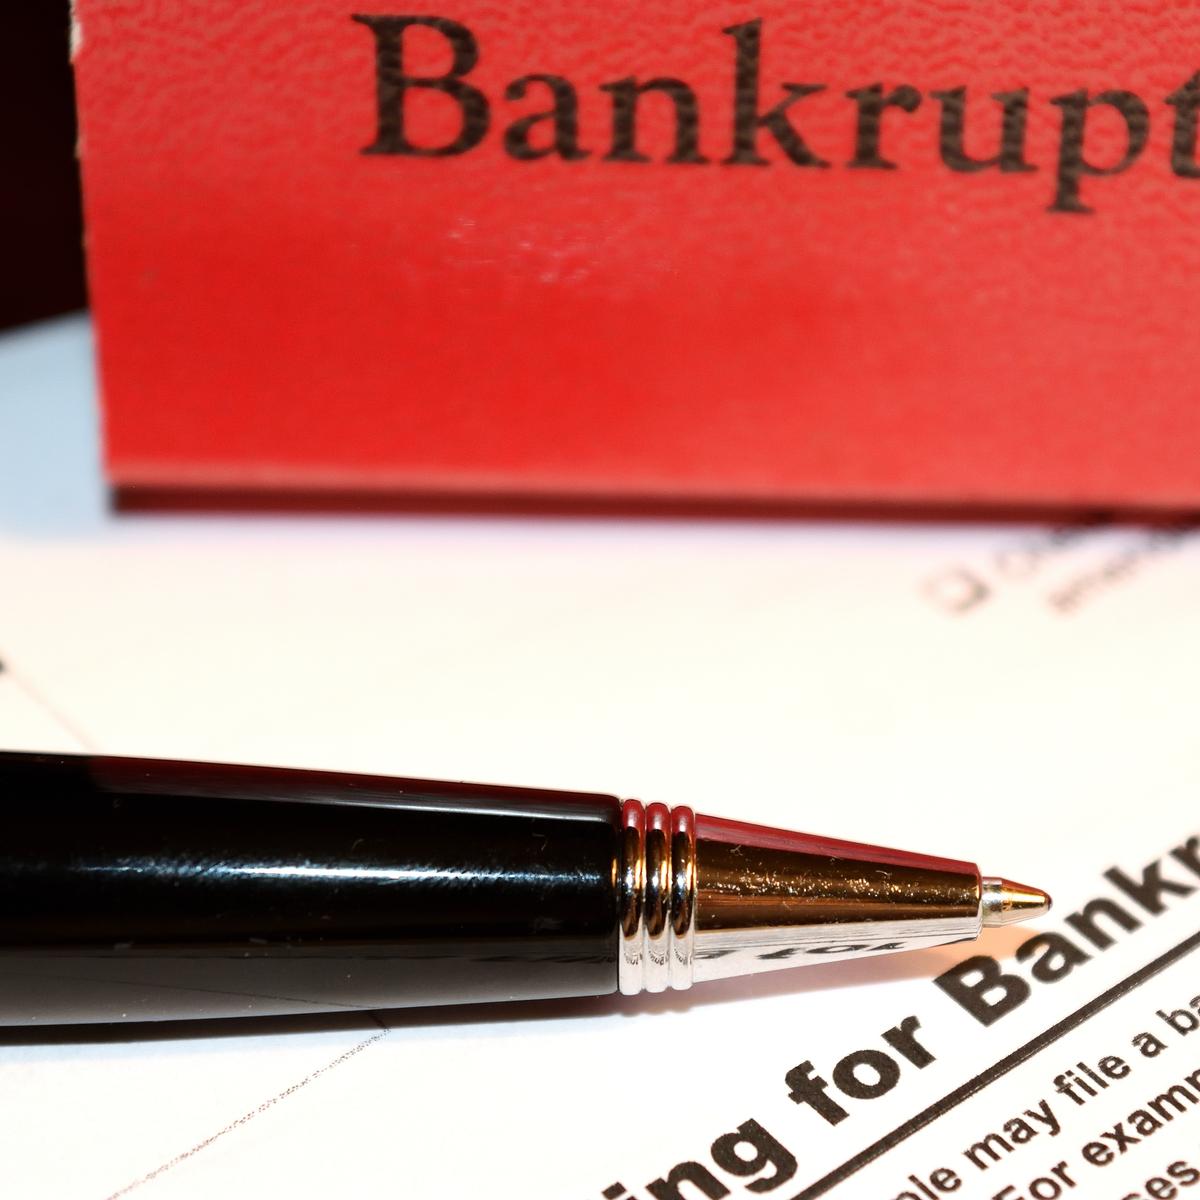 A pen and a bankruptcy folder